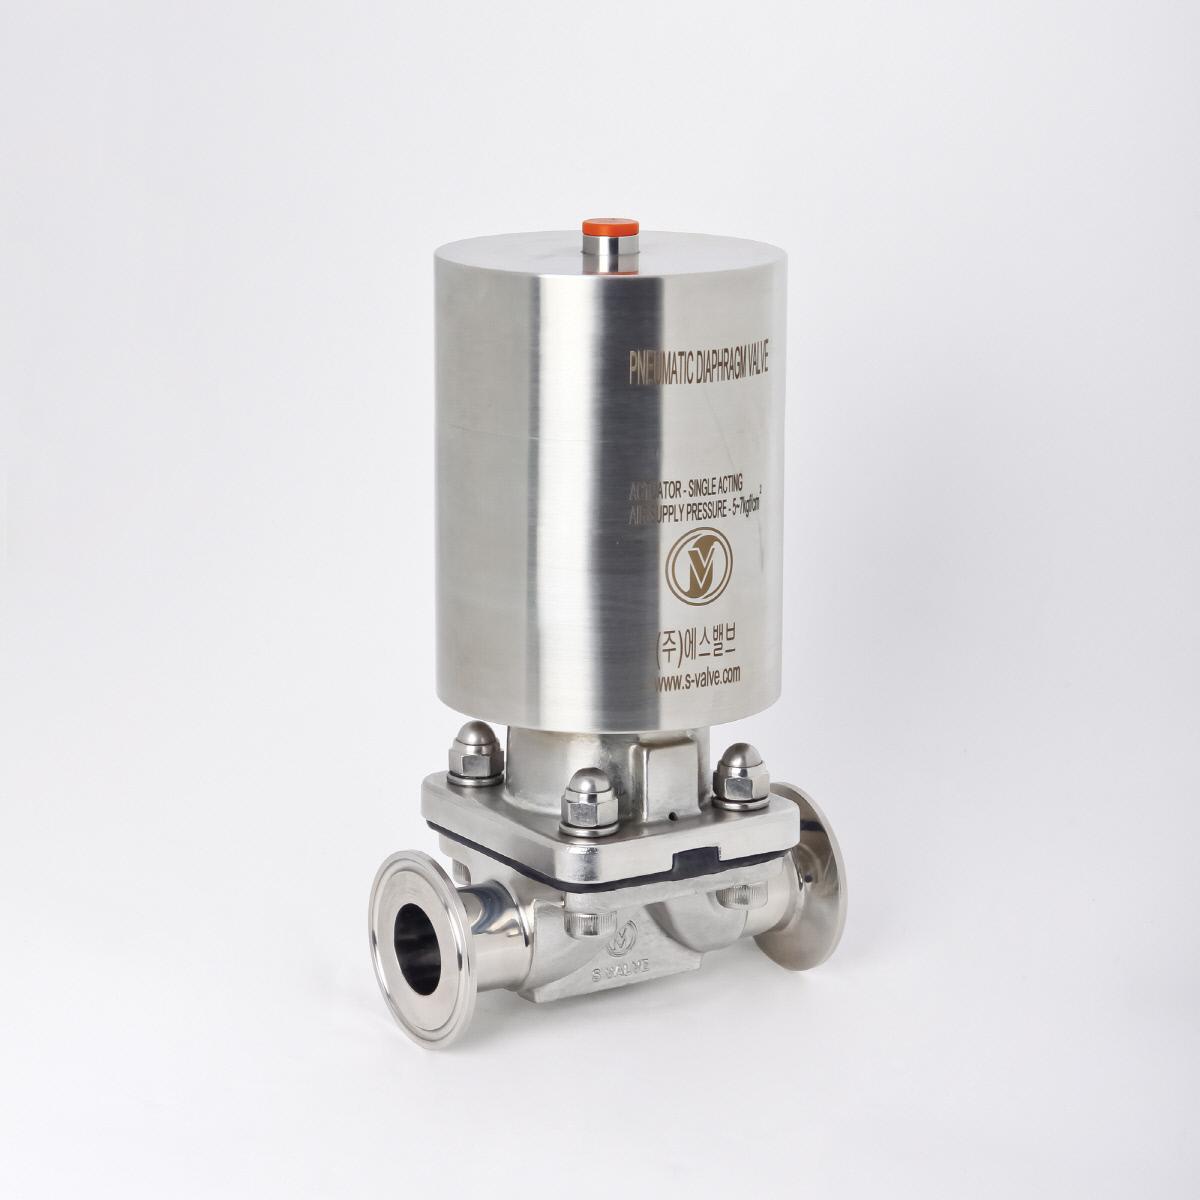 S-valve_0026.jpg